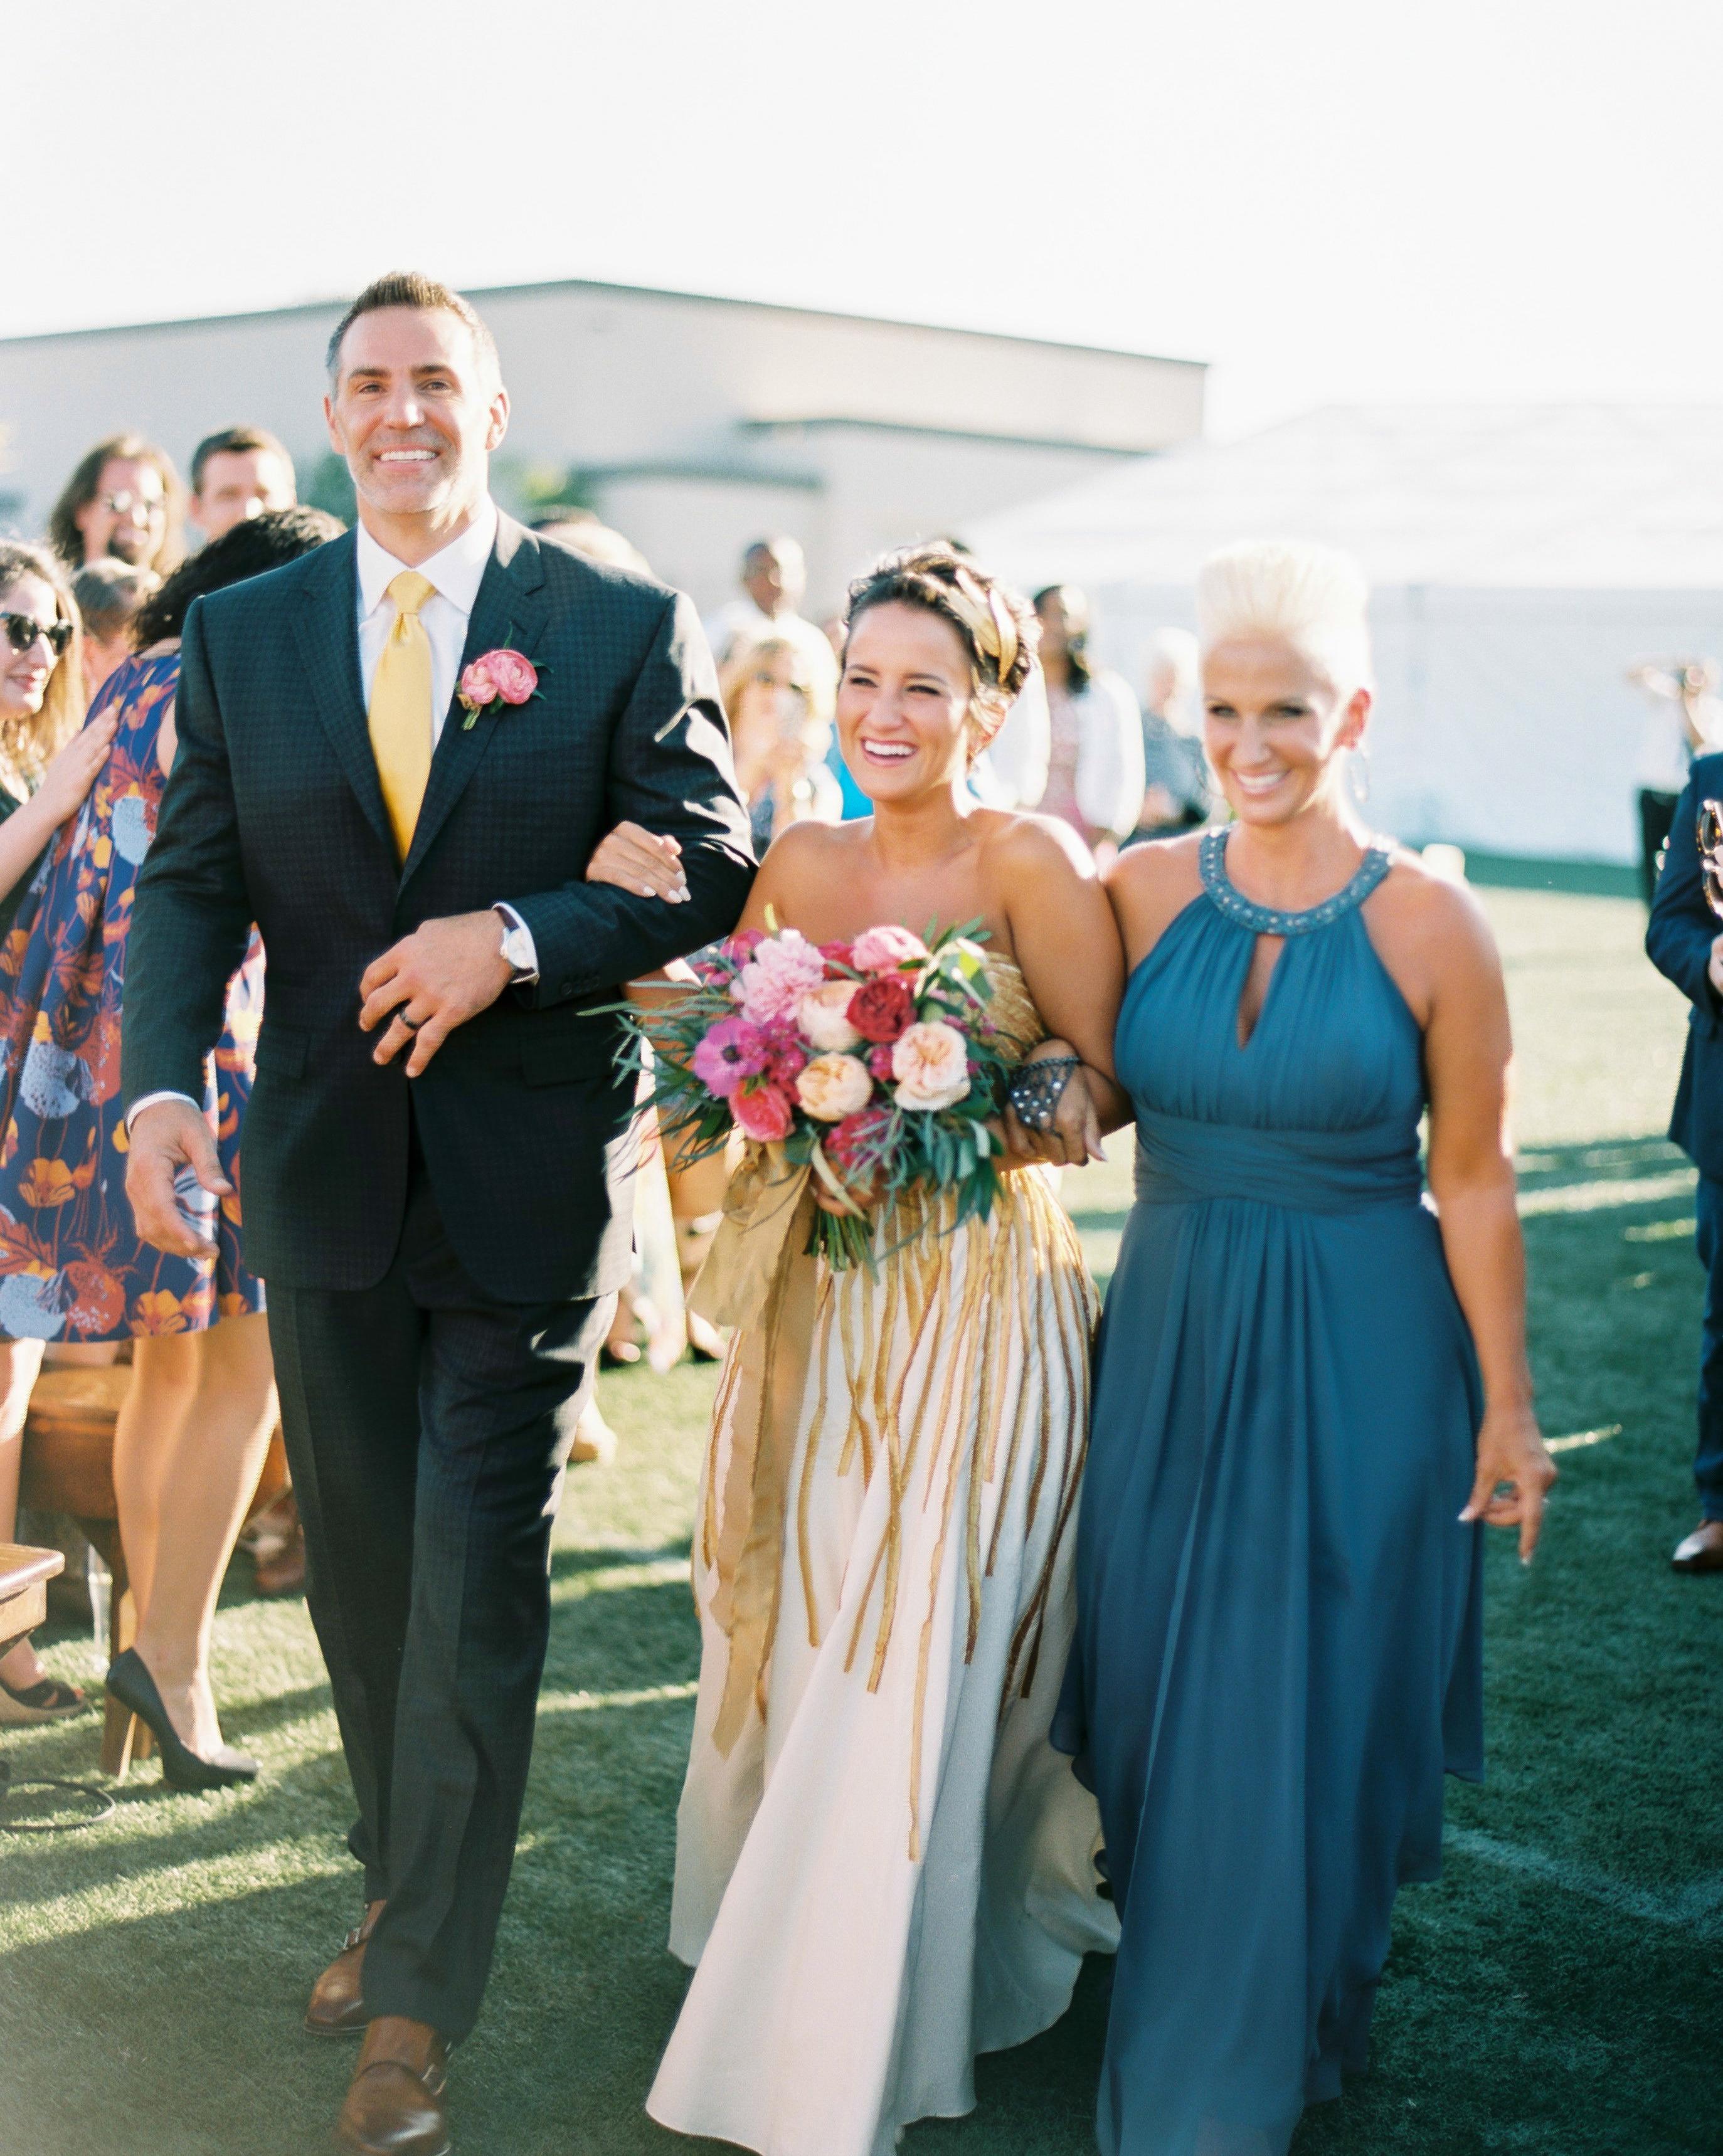 jessejo-daniel-wedding-parents-202-s112302-1015.jpg